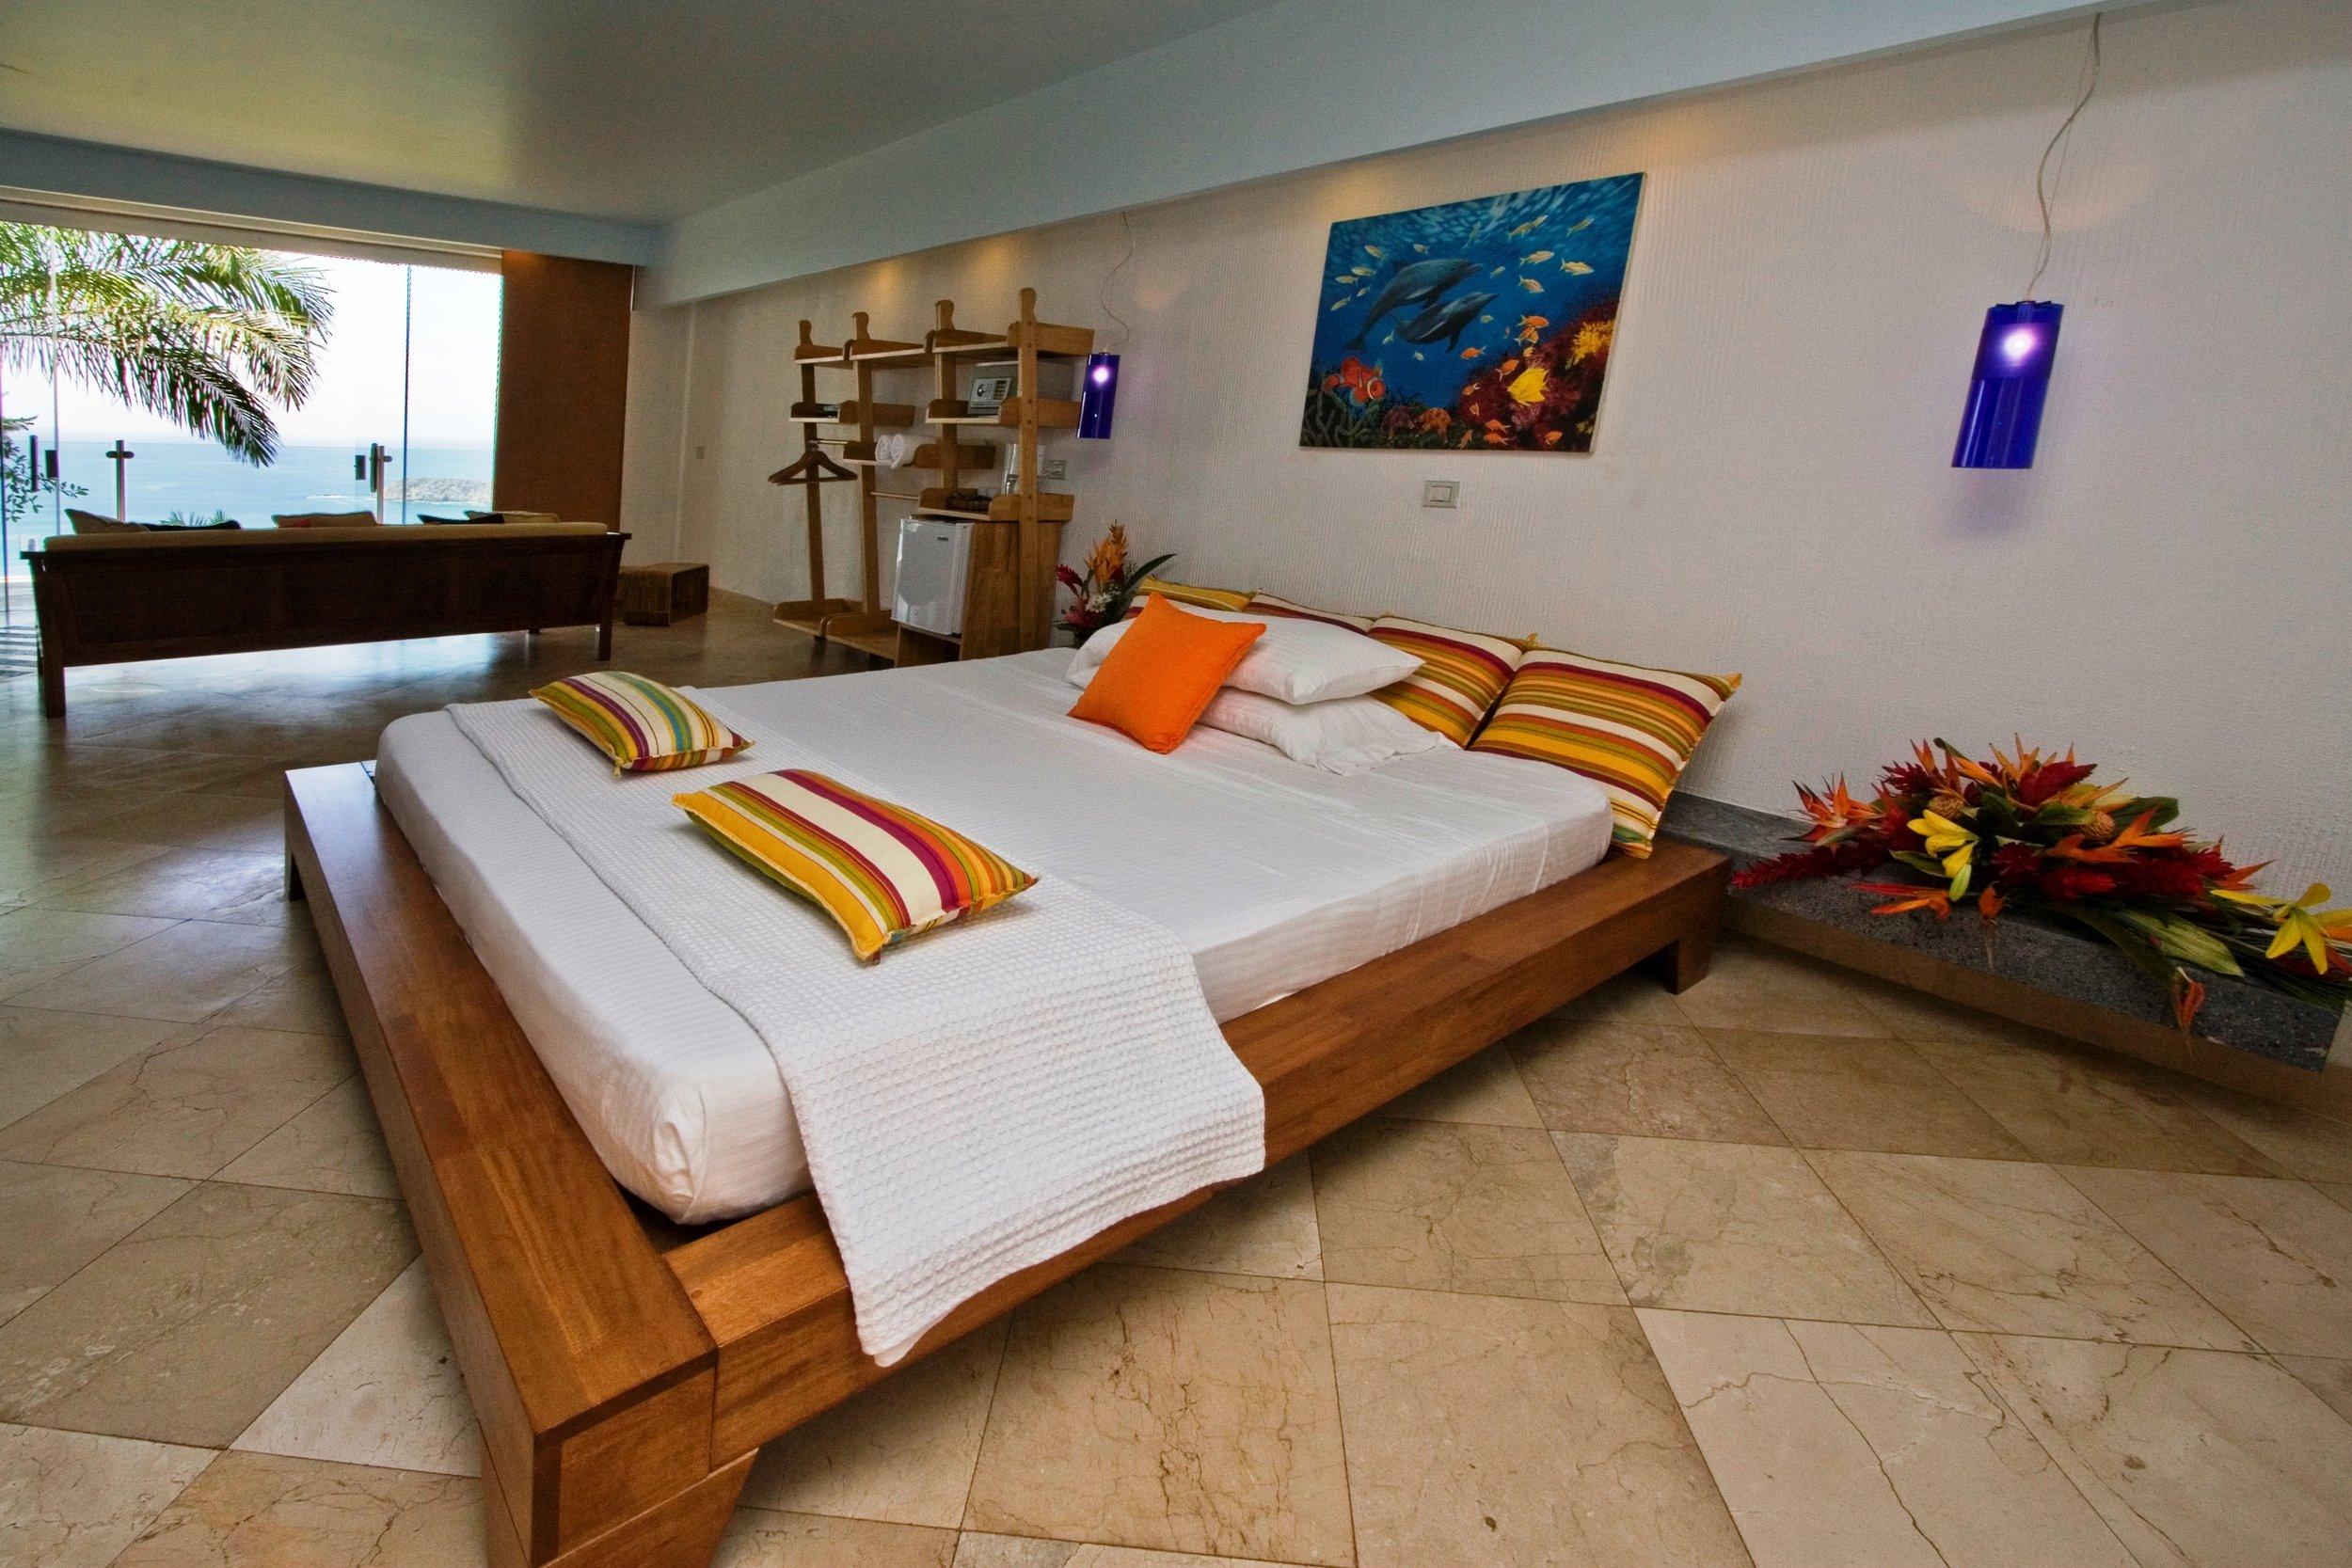 HOTEL MARIPOSA room.jpg